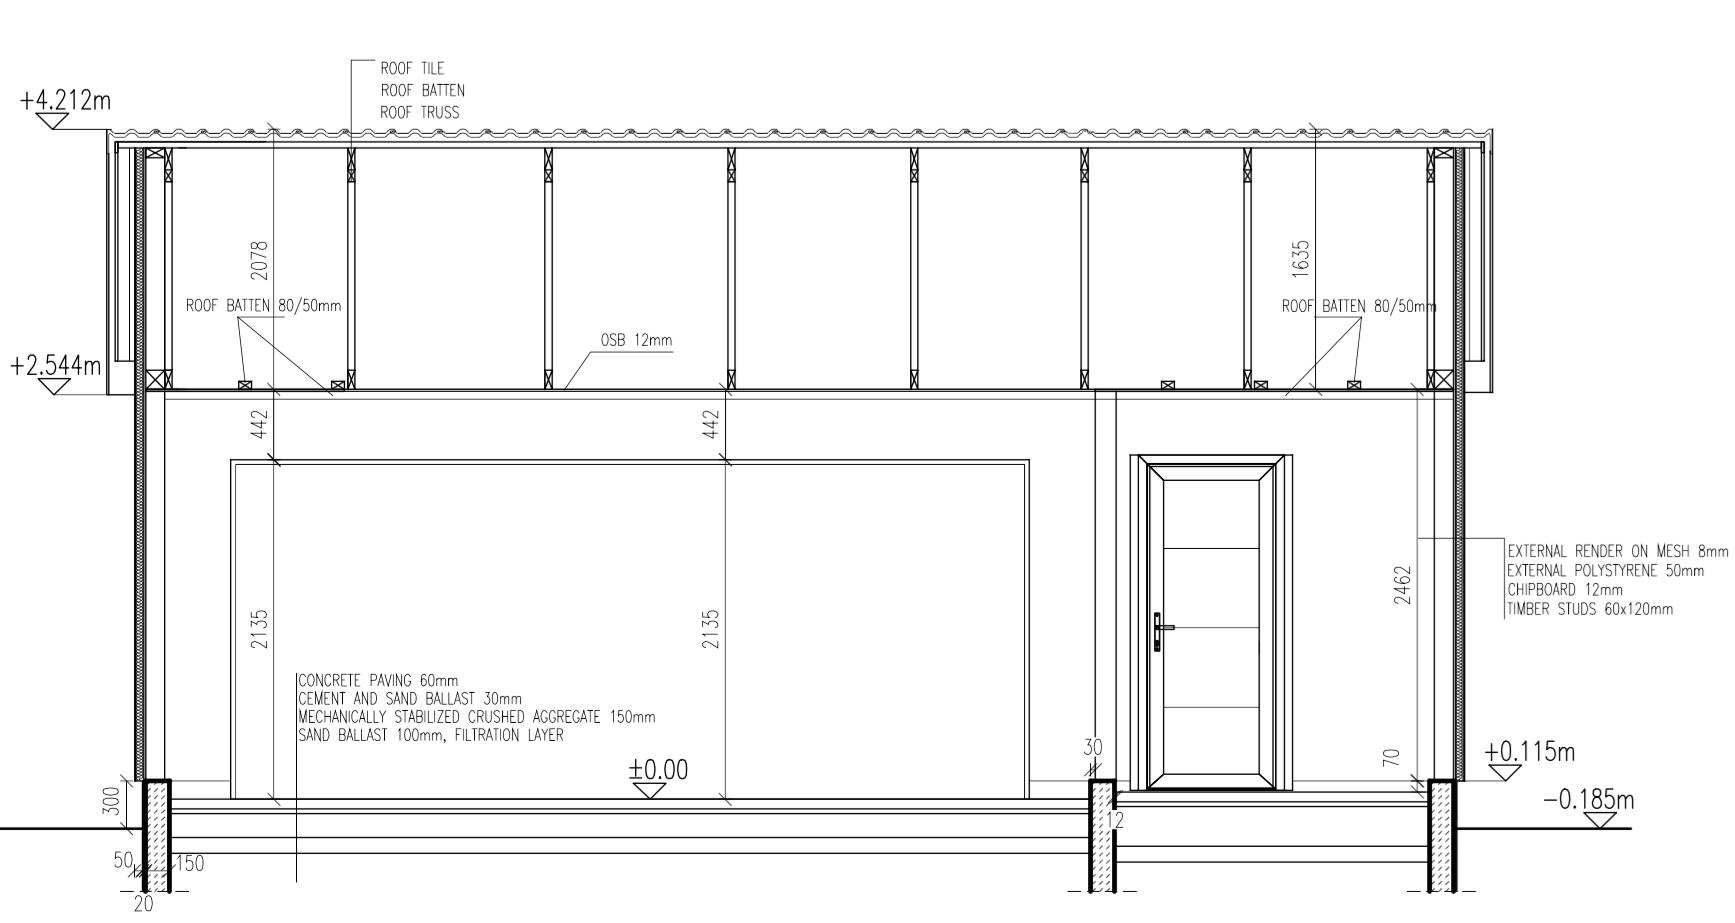 Timber Frame Garage - Timber Frame - BuildHub.org.uk